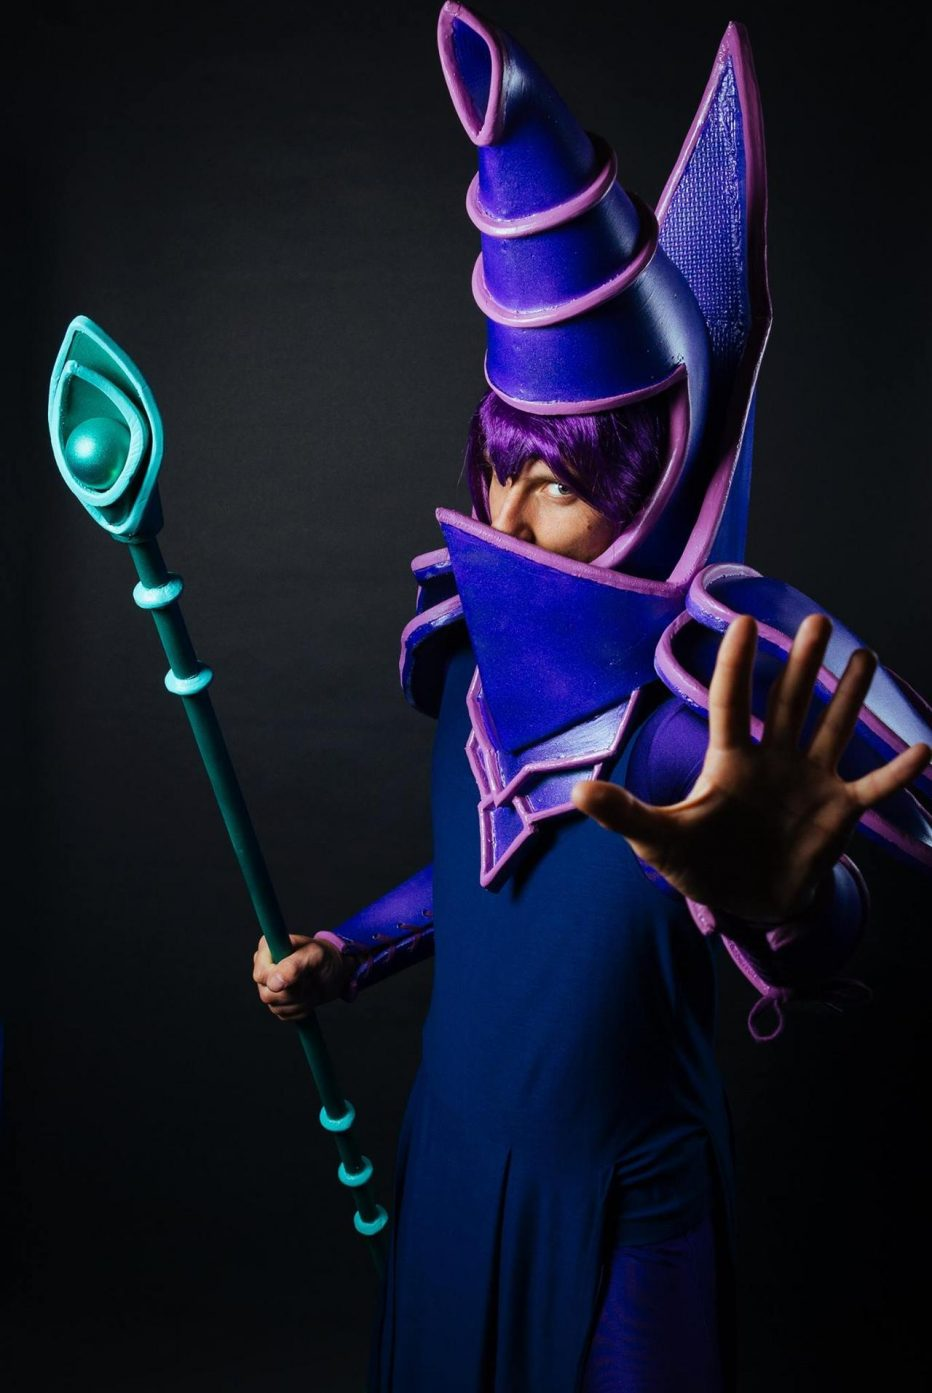 Yu-Gi-Oh-Dark-Magician-Cosplay-Gamers-Heroes-1.jpg